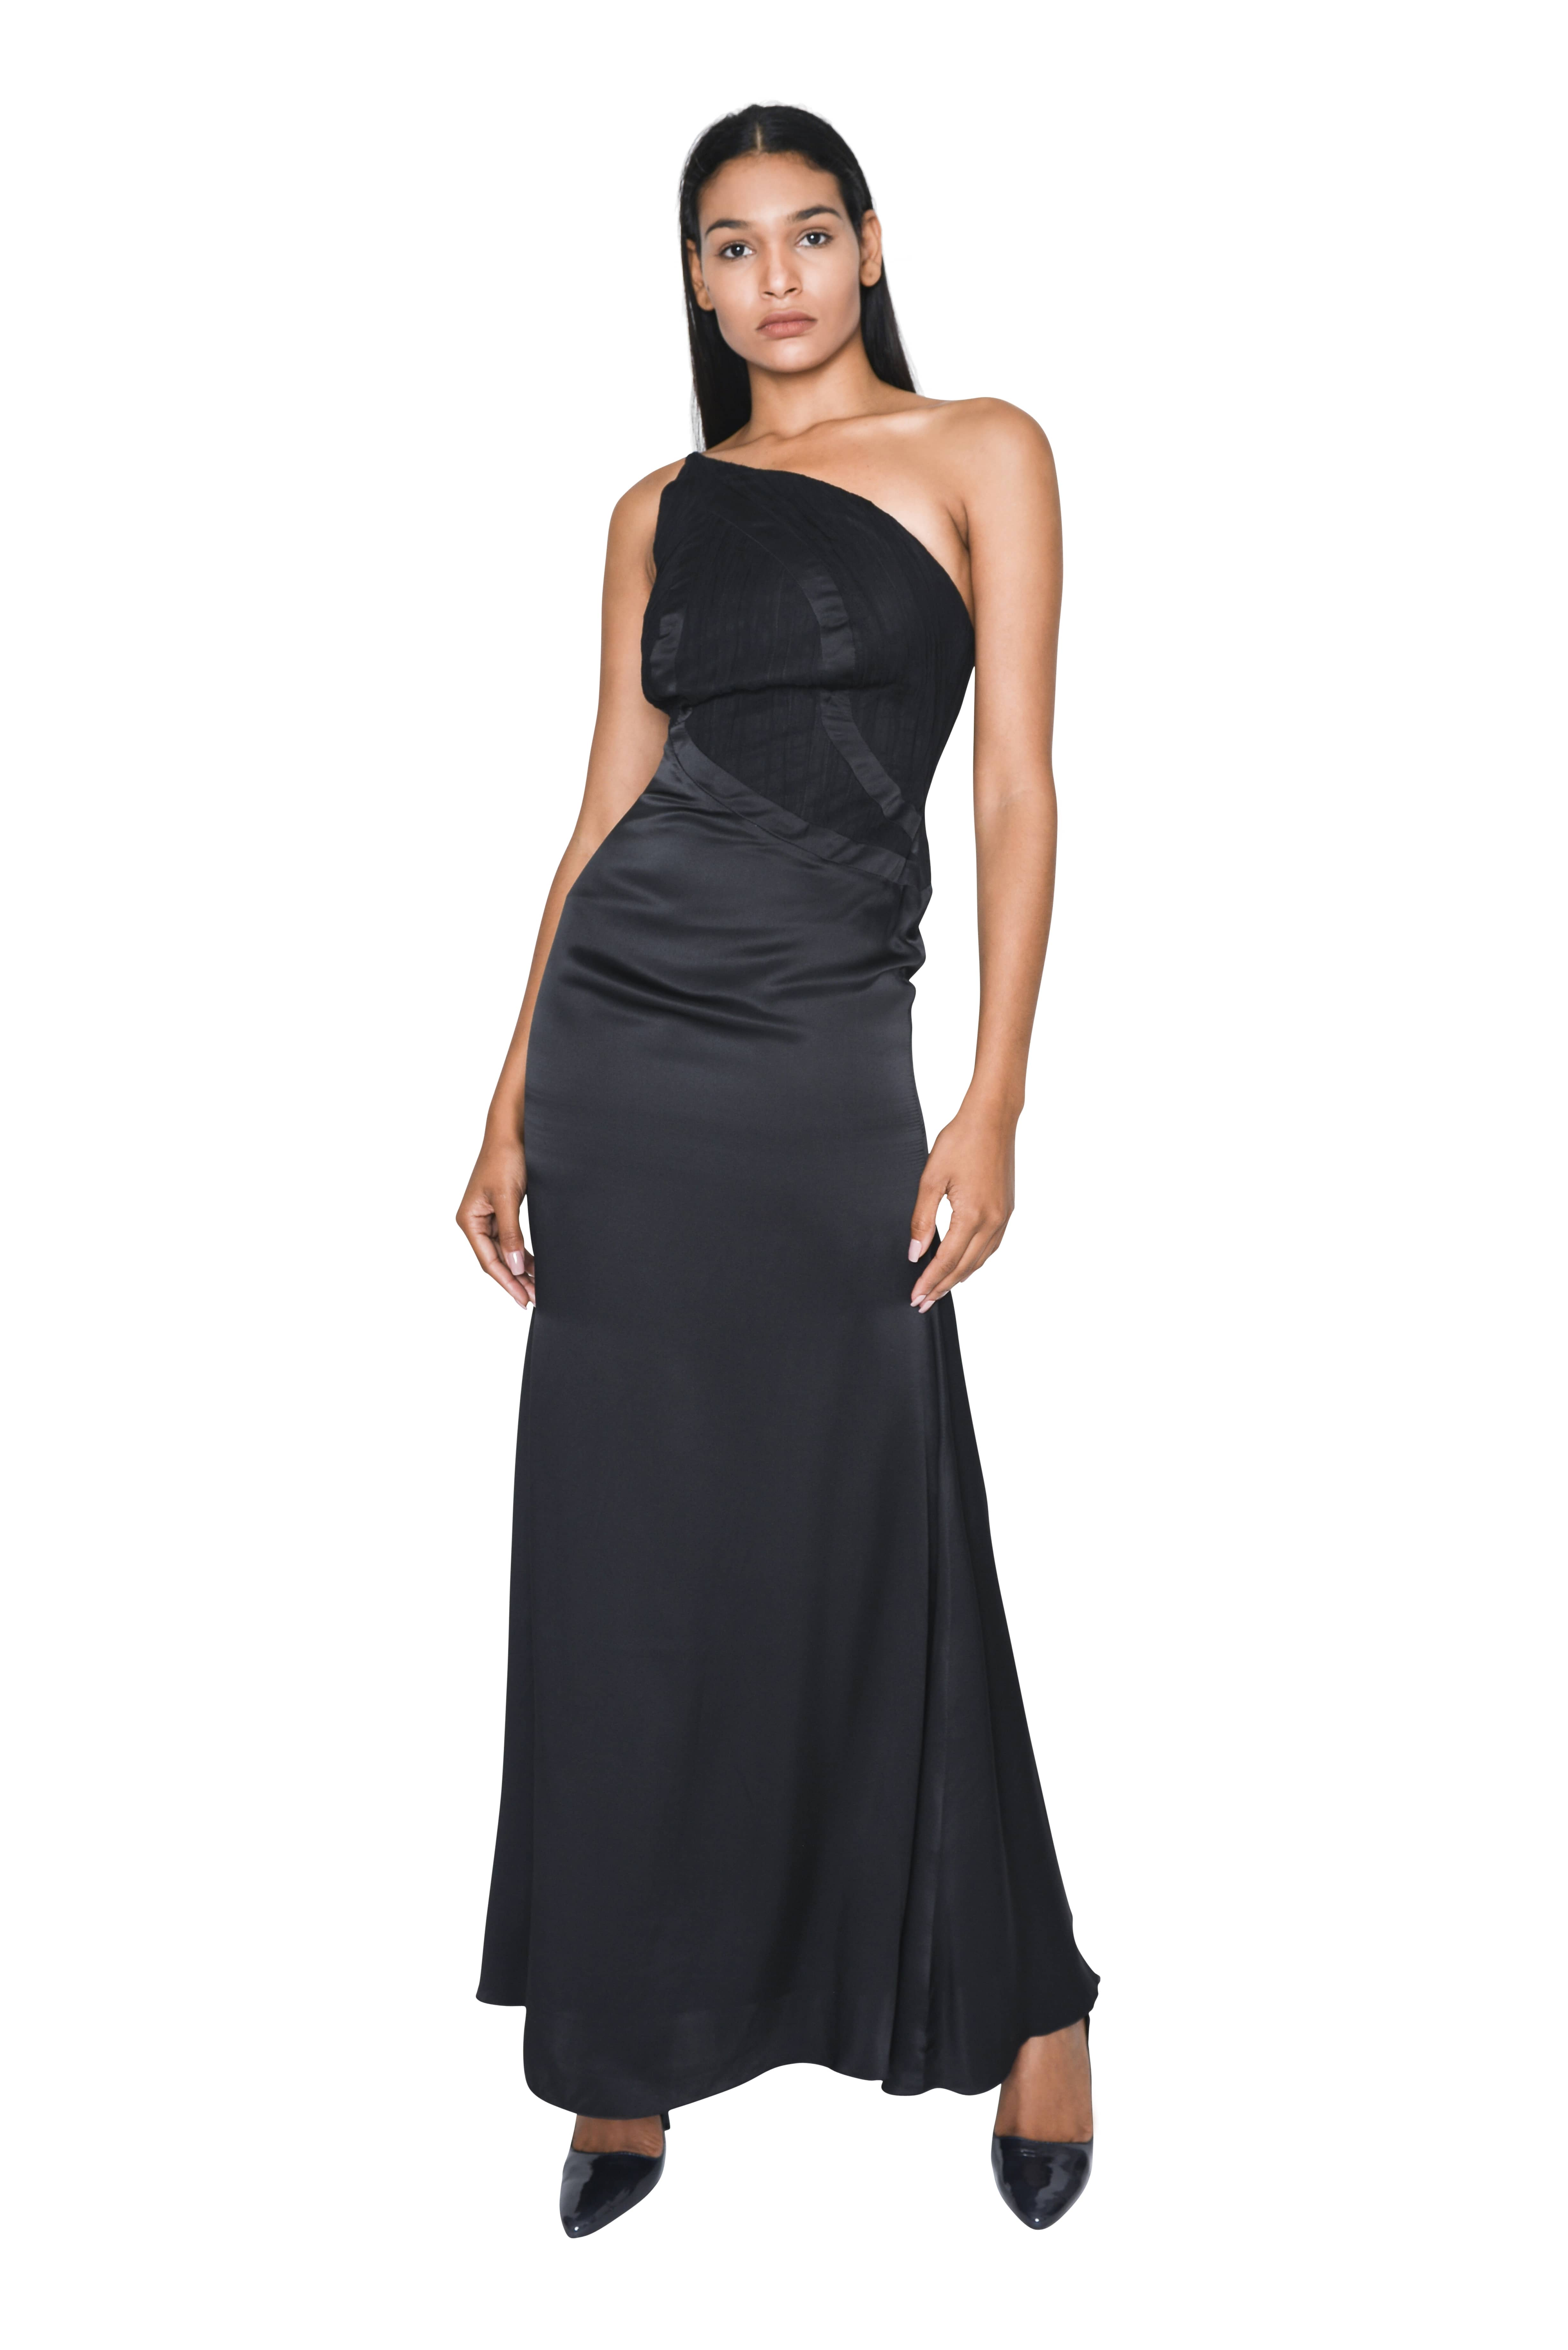 Dress ELTAMIN II 0